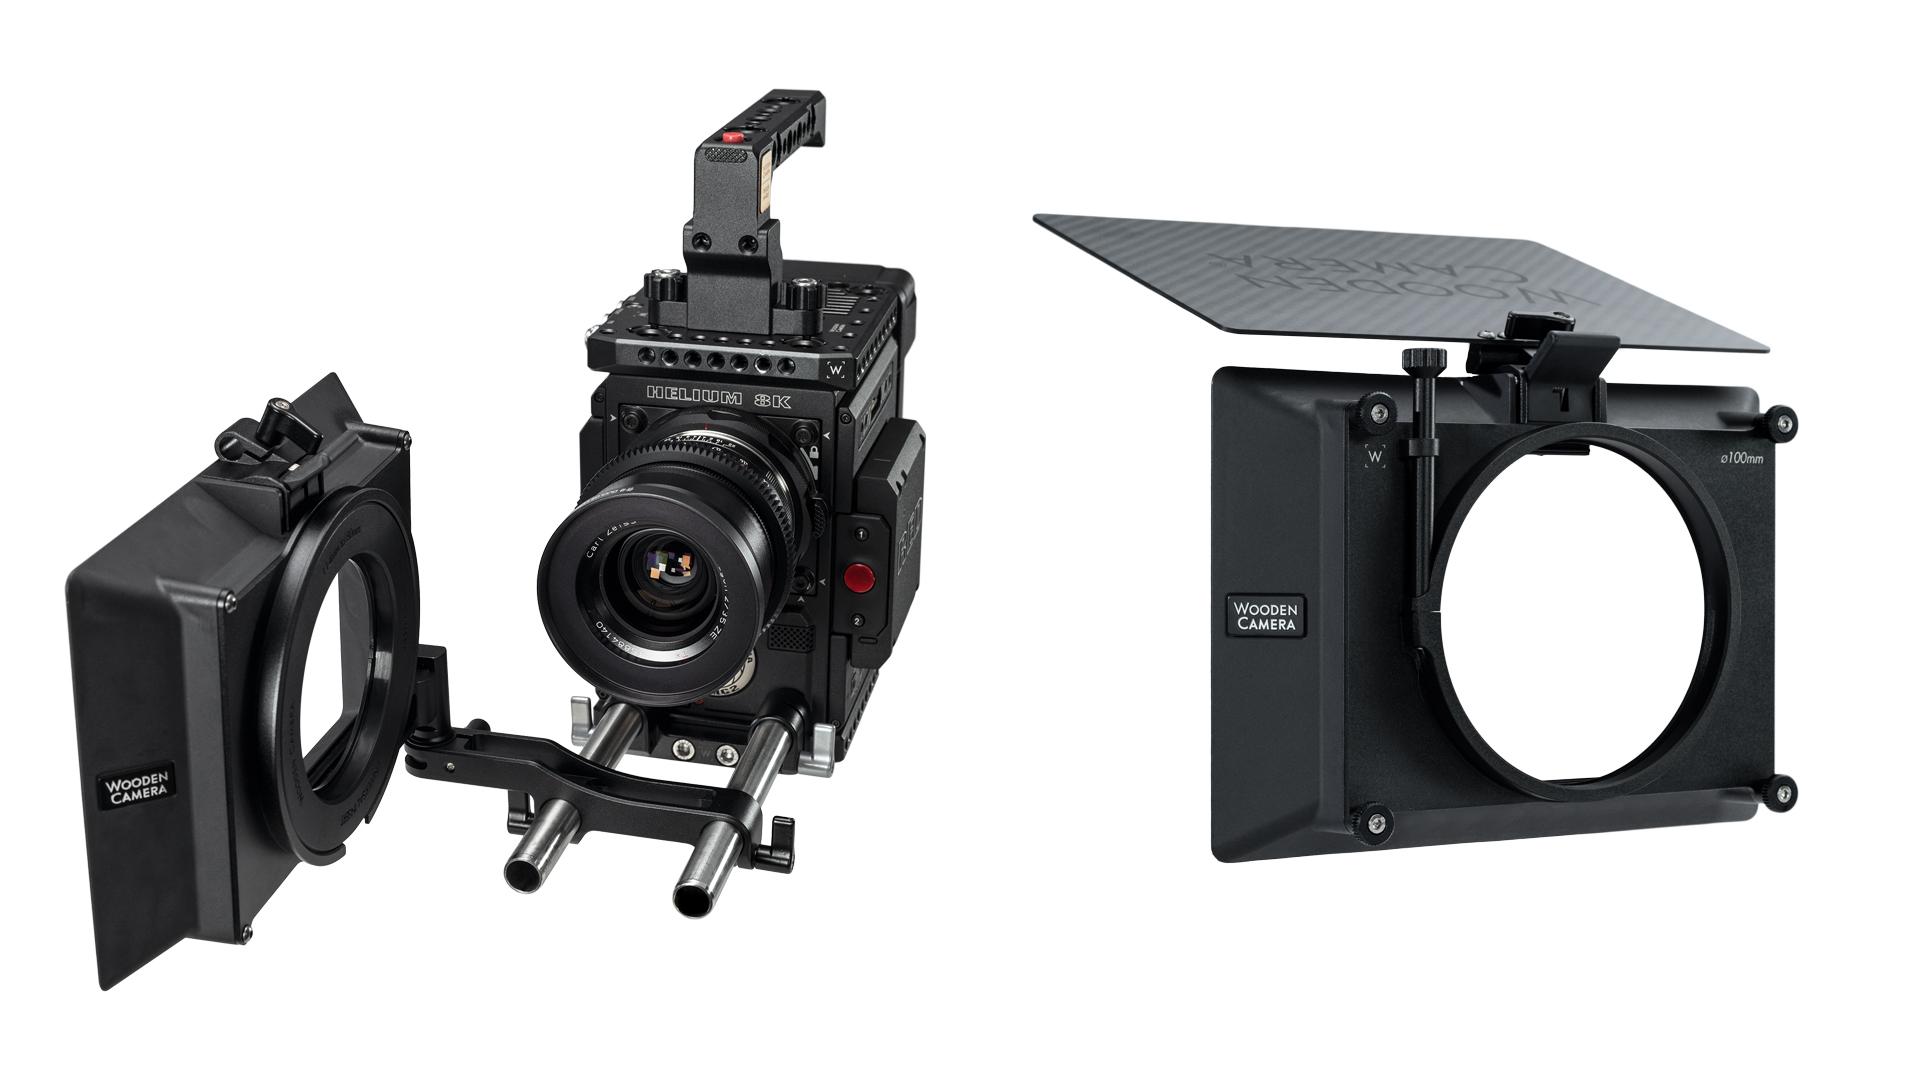 Zip Box Pro de Wooden Camera - Caja mate pequeñita, ya está disponible